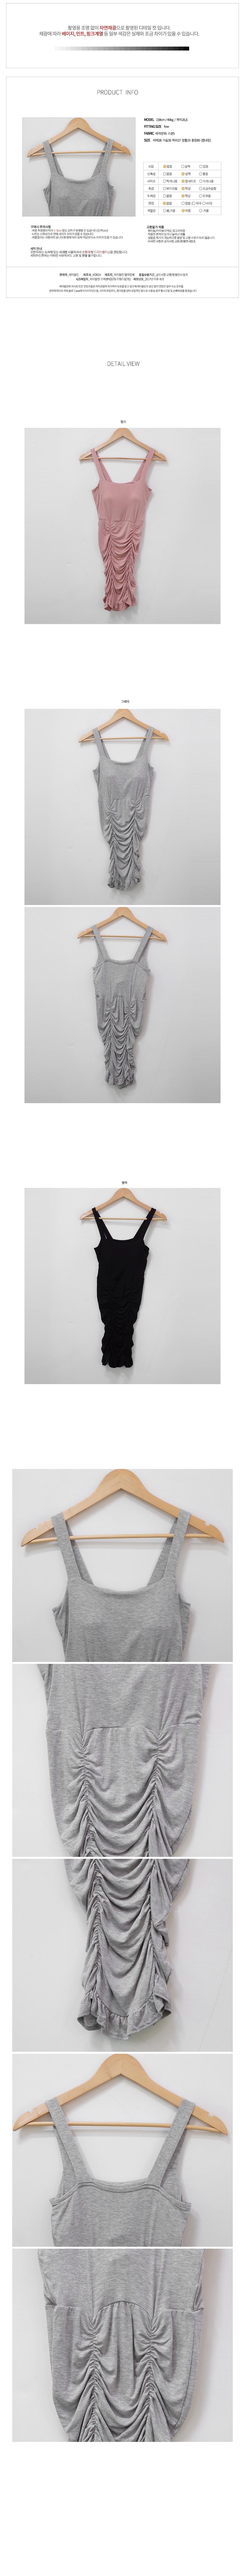 Mimo Ruffle Shirring Sleeveless Dress+ Chaos Linen Crop Jacket